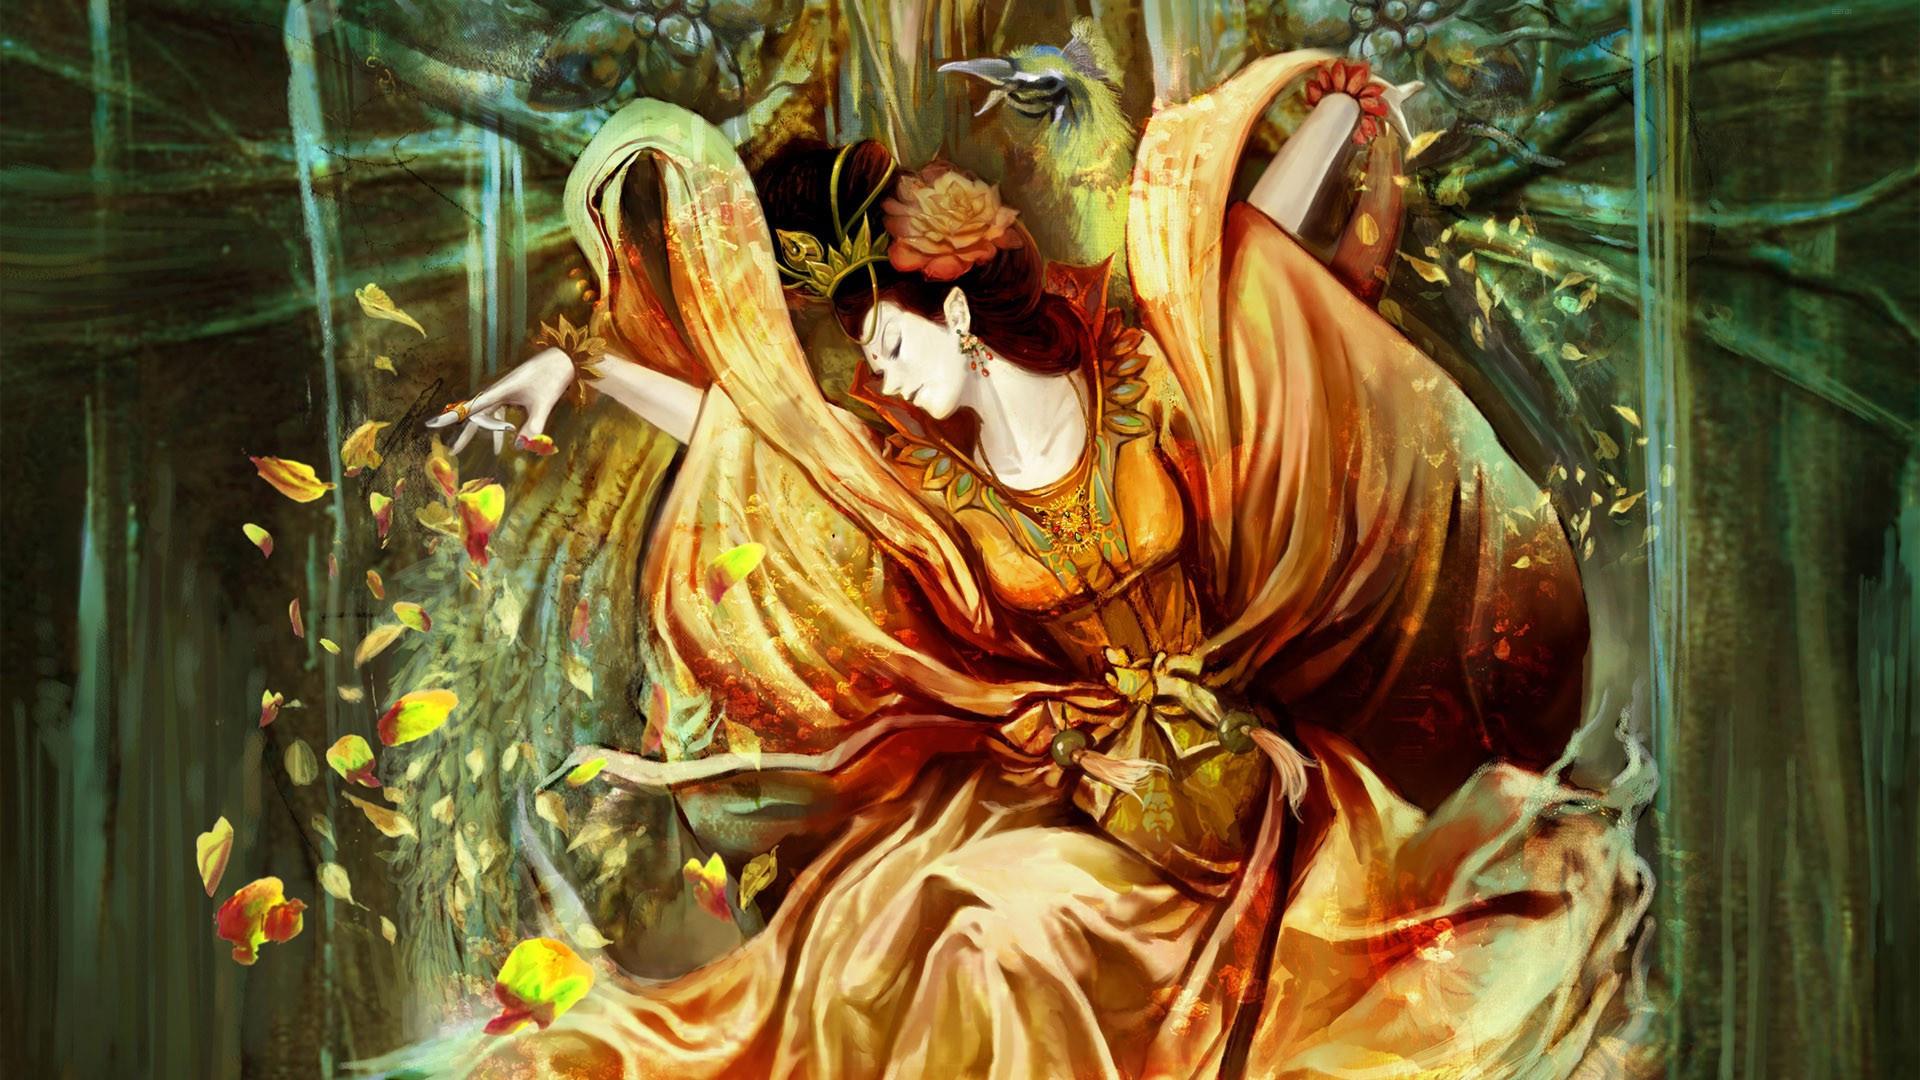 Anime Geisha wallpaper 234148 1920x1080